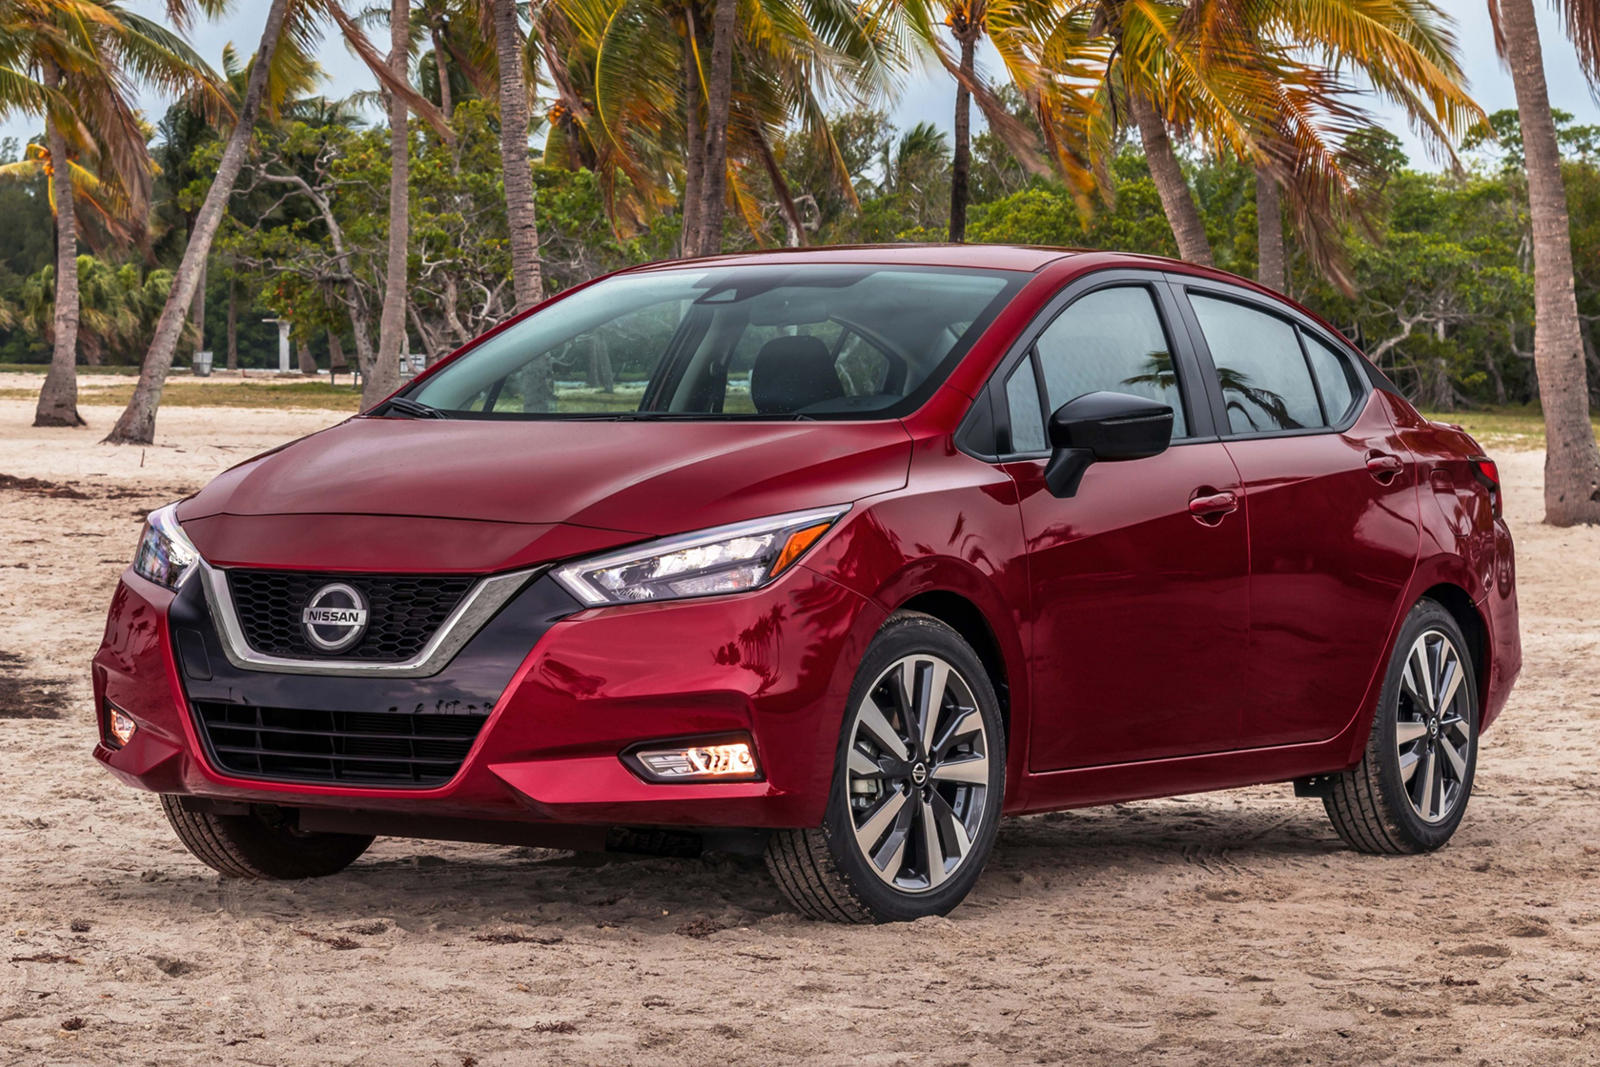 2020 Nissan Versa Arrives With Fresh New Design | CarBuzz